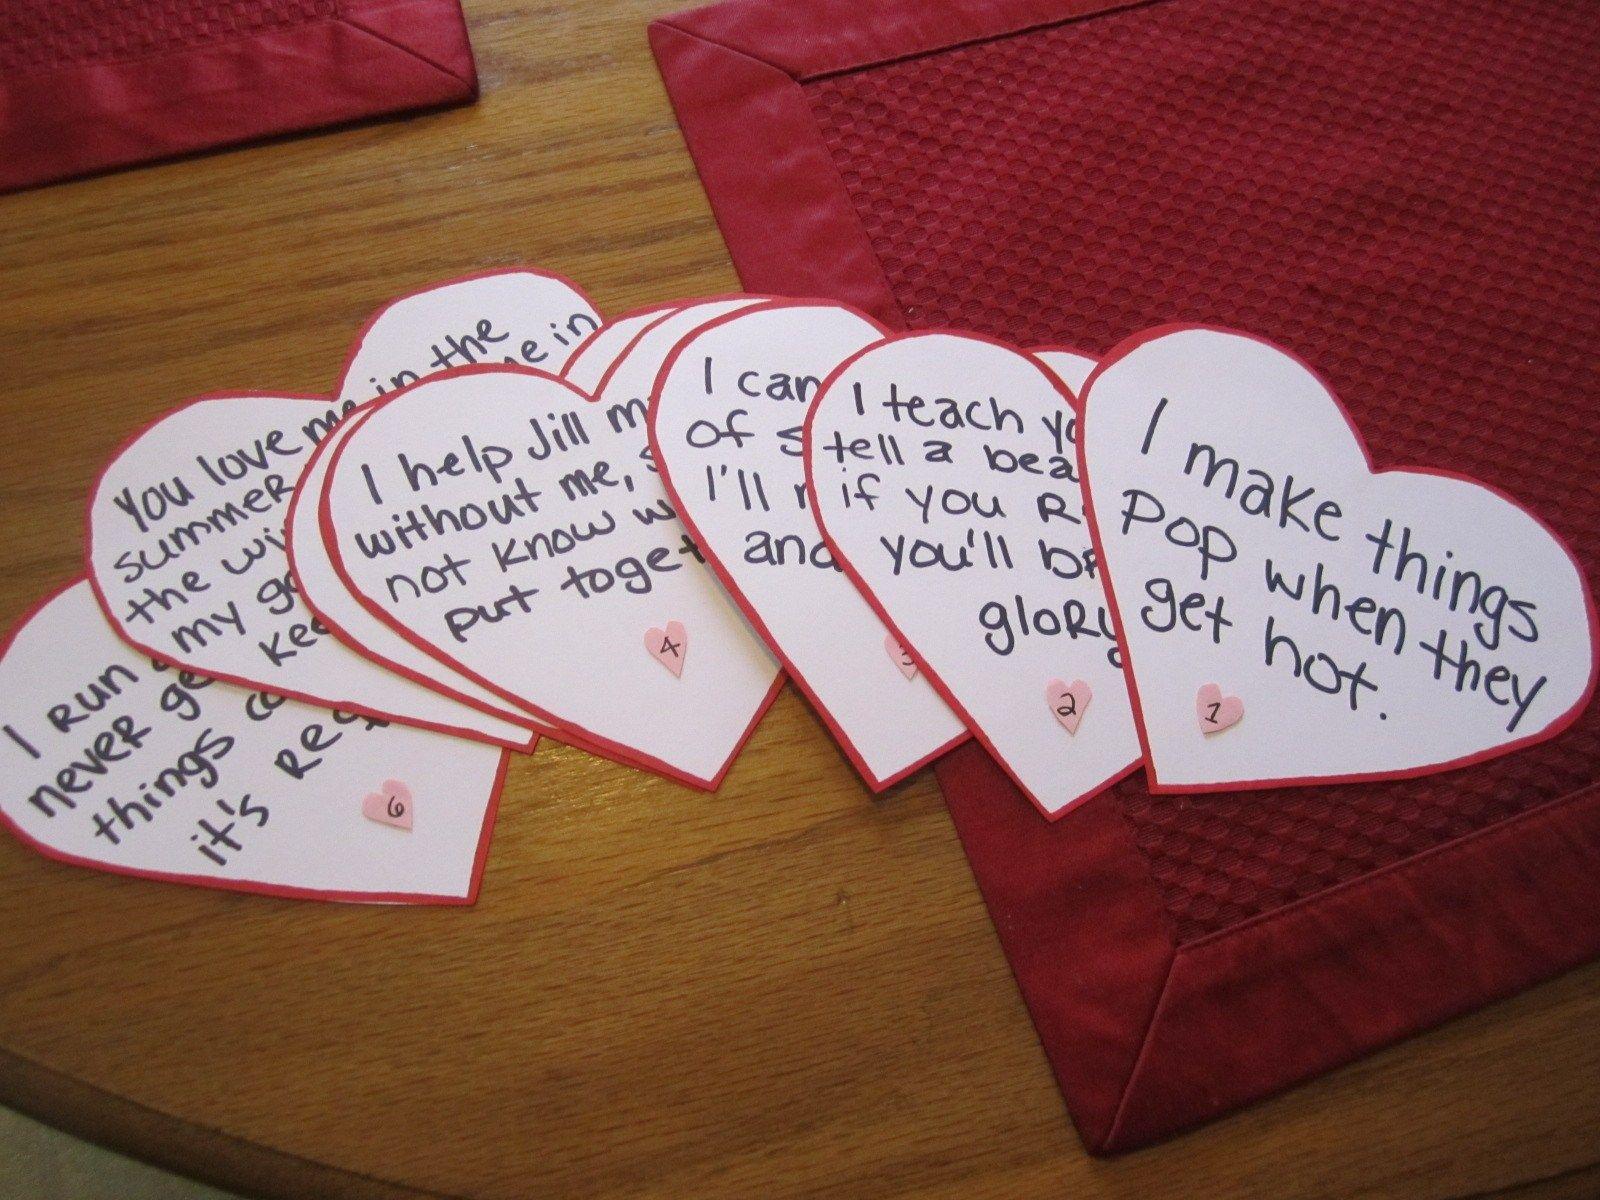 Awesome Walmart Valentine Gifts For Her Him 1600x1200 Ten Diy Valentine39s Day